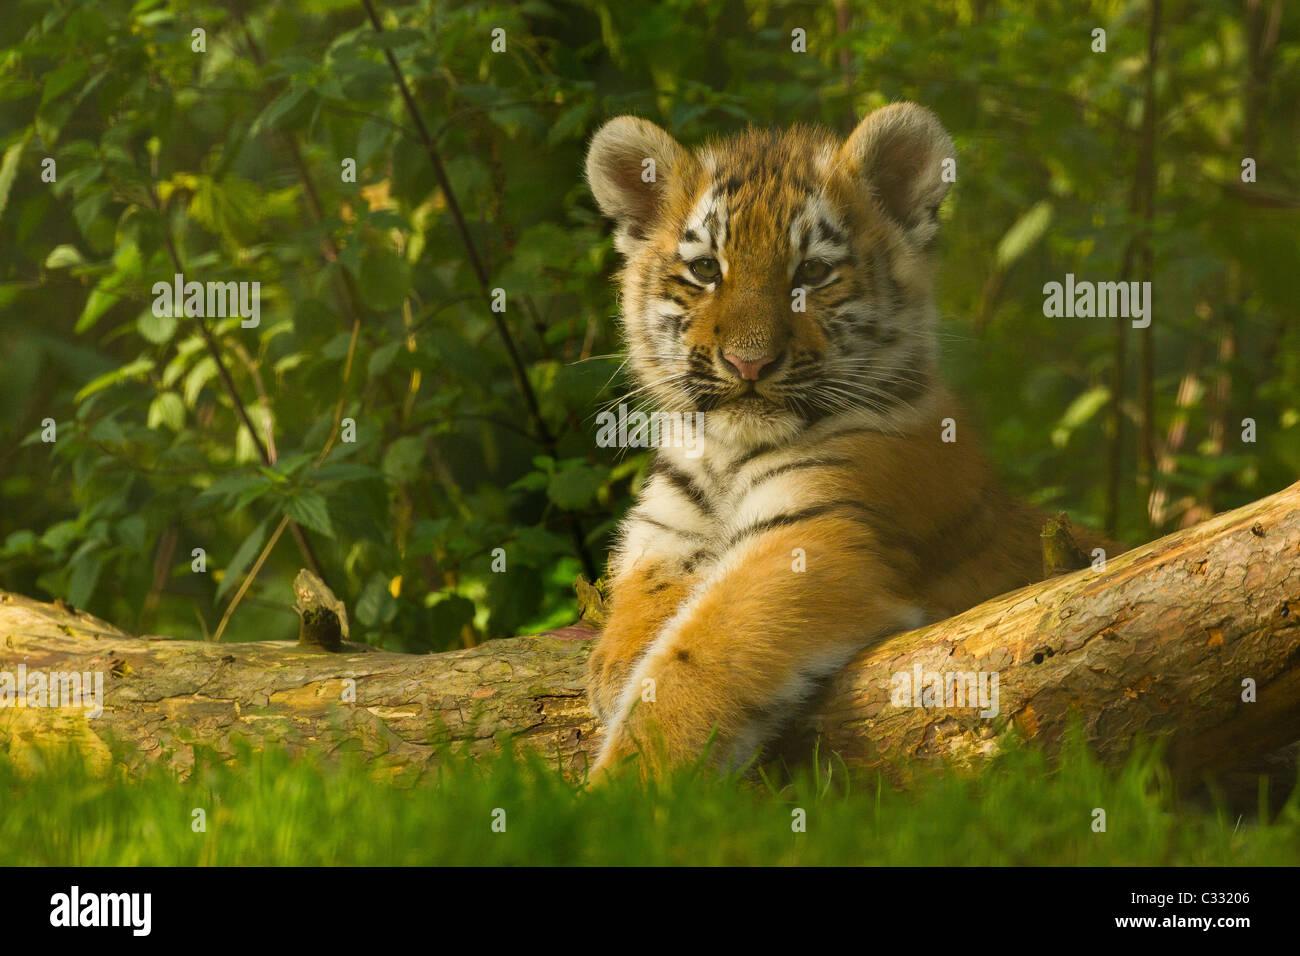 Siberian/Amur Tiger Cub on Log - Stock Image